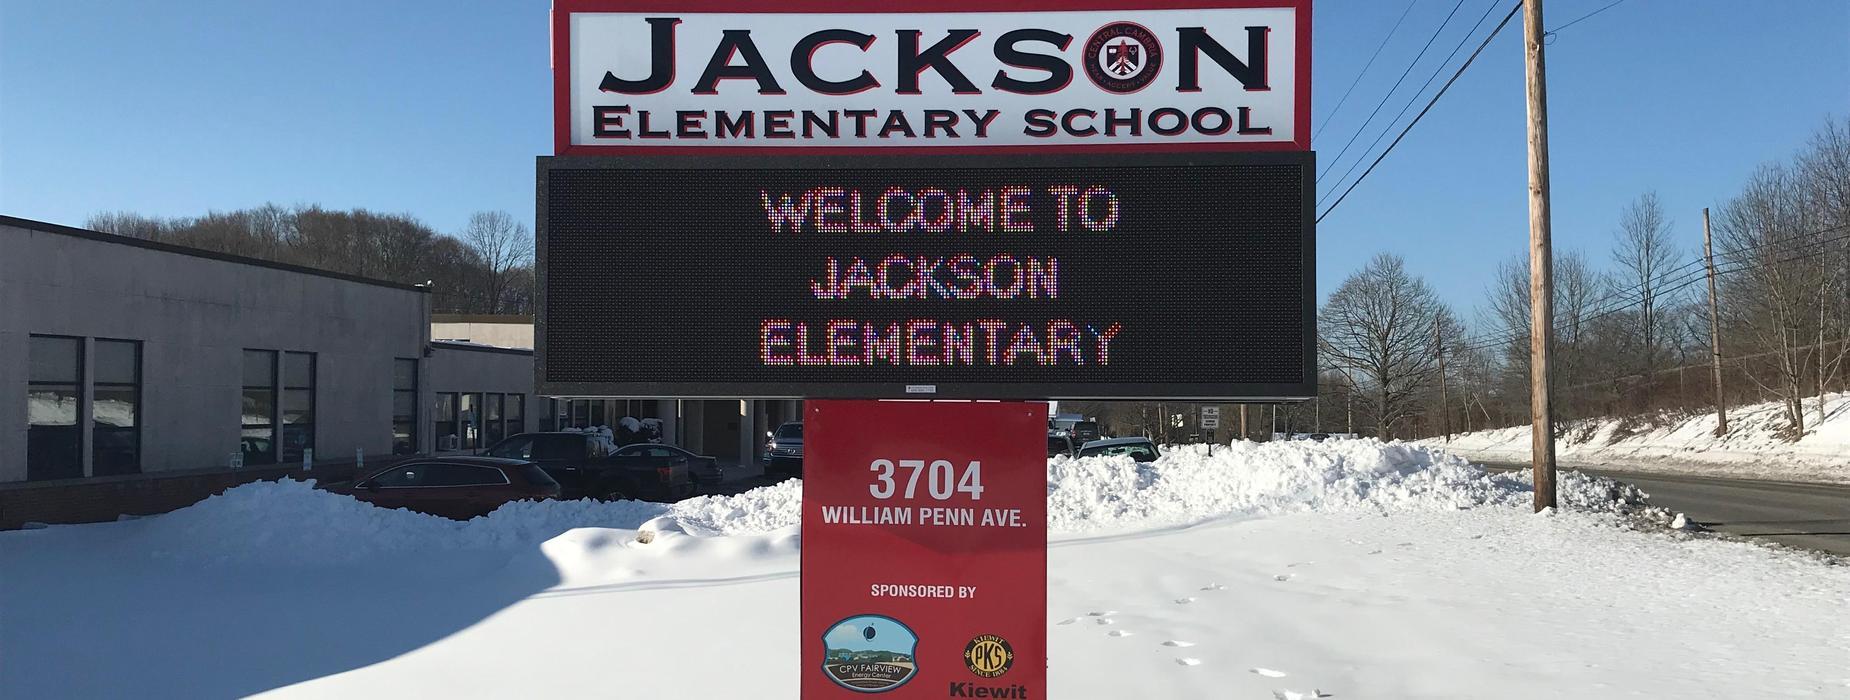 Photo of Jackson Elementary digital sign